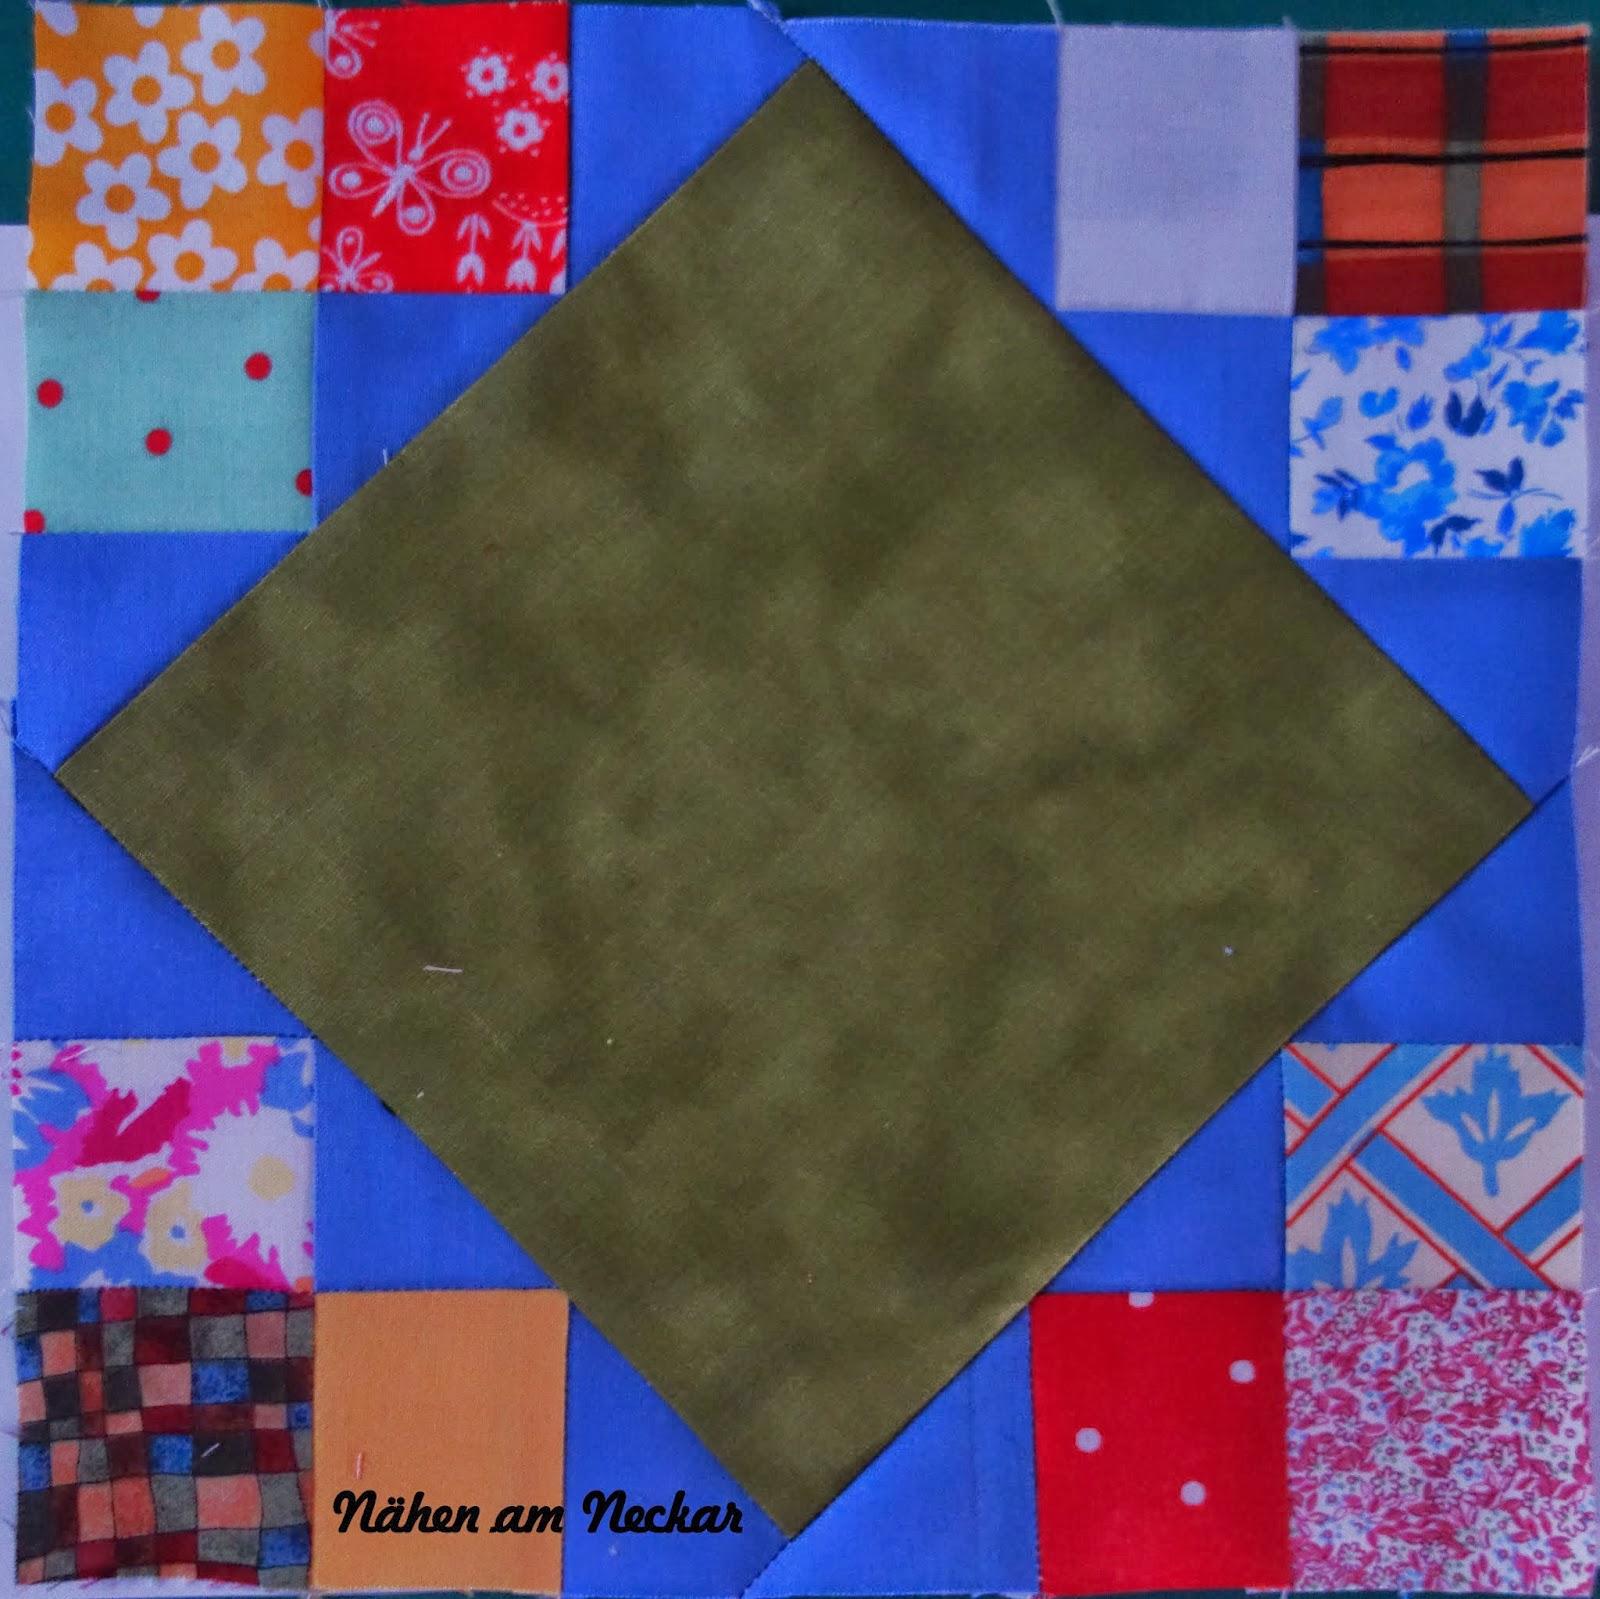 nÄhen am neckar anleitung für meinen irish chain quilt ~ Bücherregal Quilt Anleitung